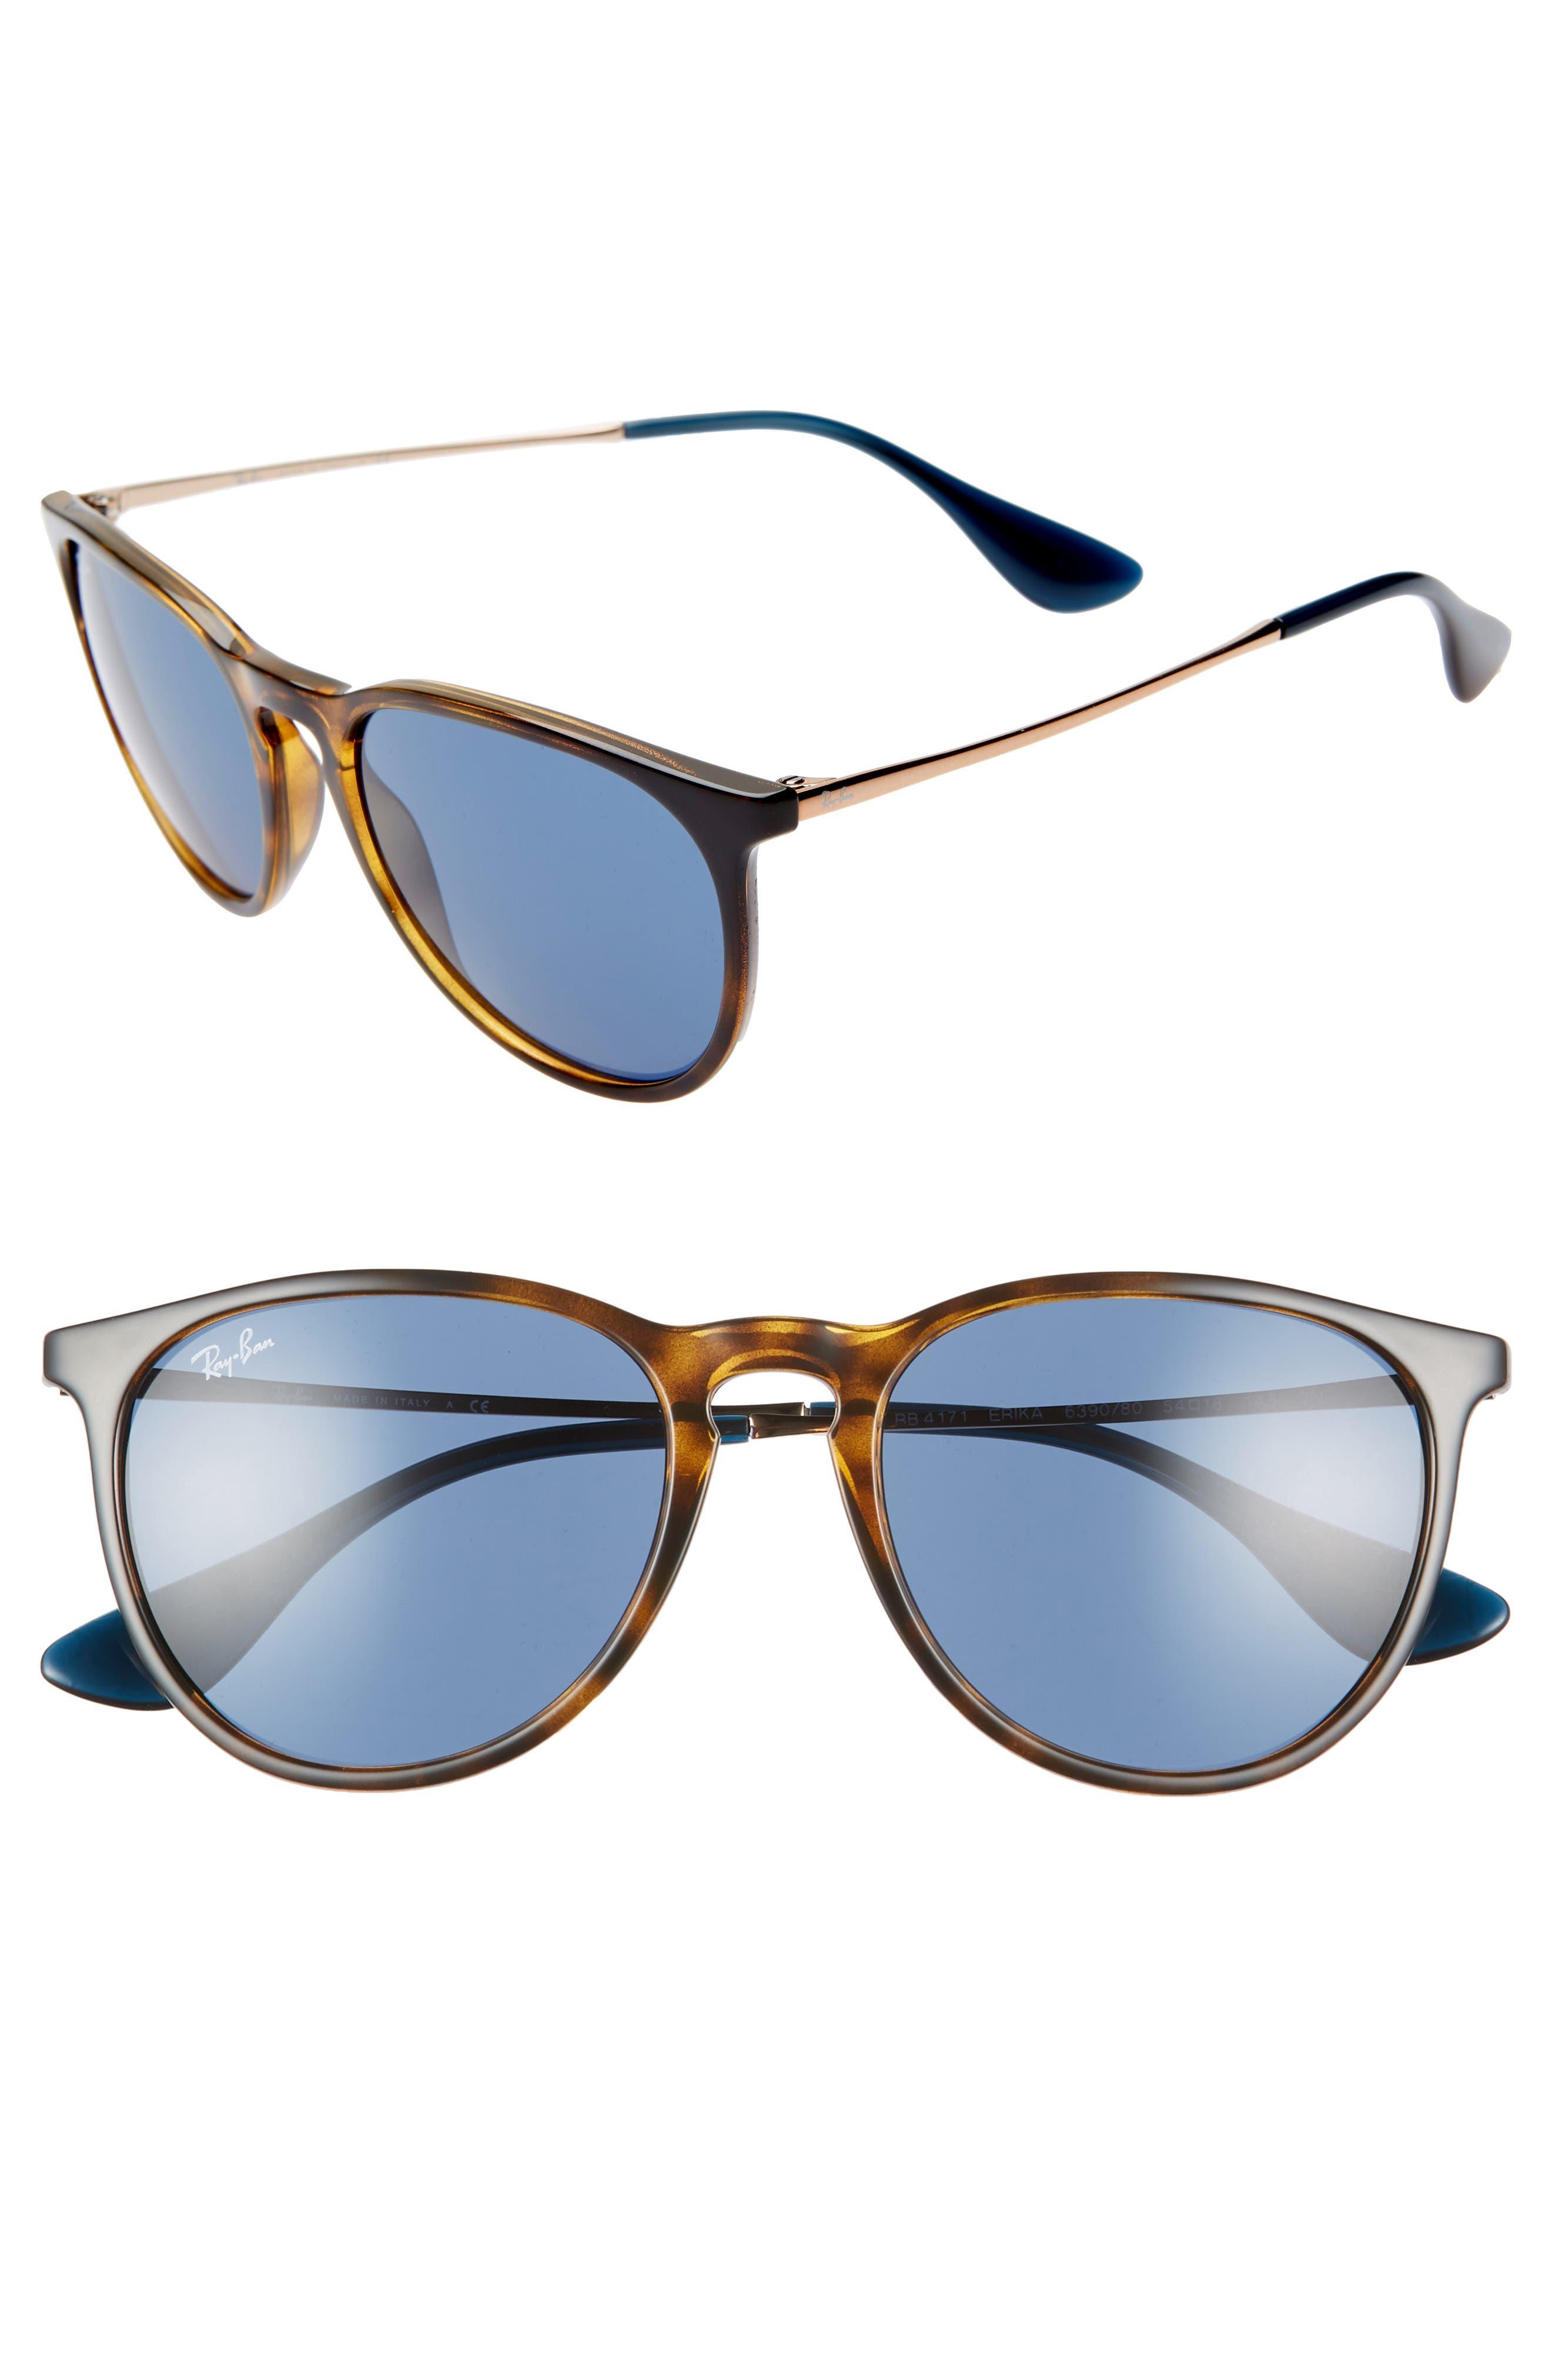 Ray-Ban Erika Classic 5m Sunglasses - Havana/ Blue Solid